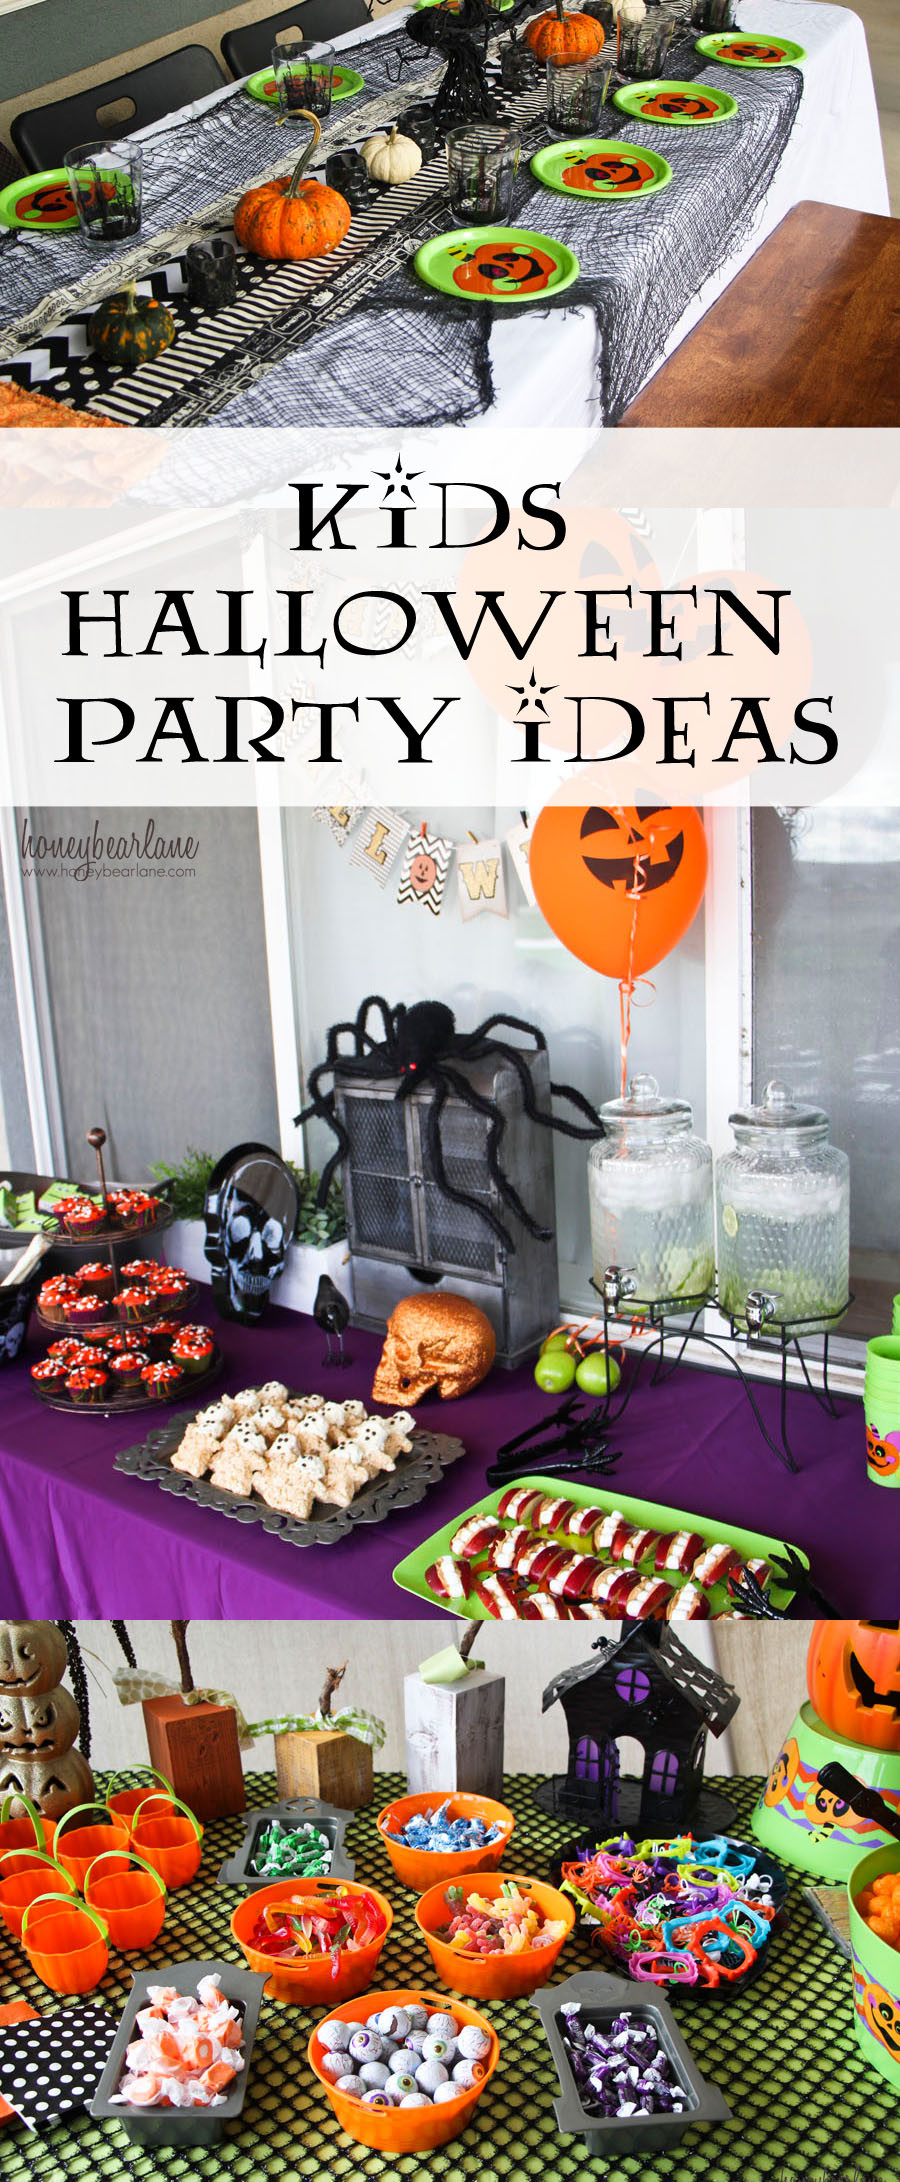 Halloween Themed Kid Party Ideas  Kids Halloween Party Ideas Honeybear Lane